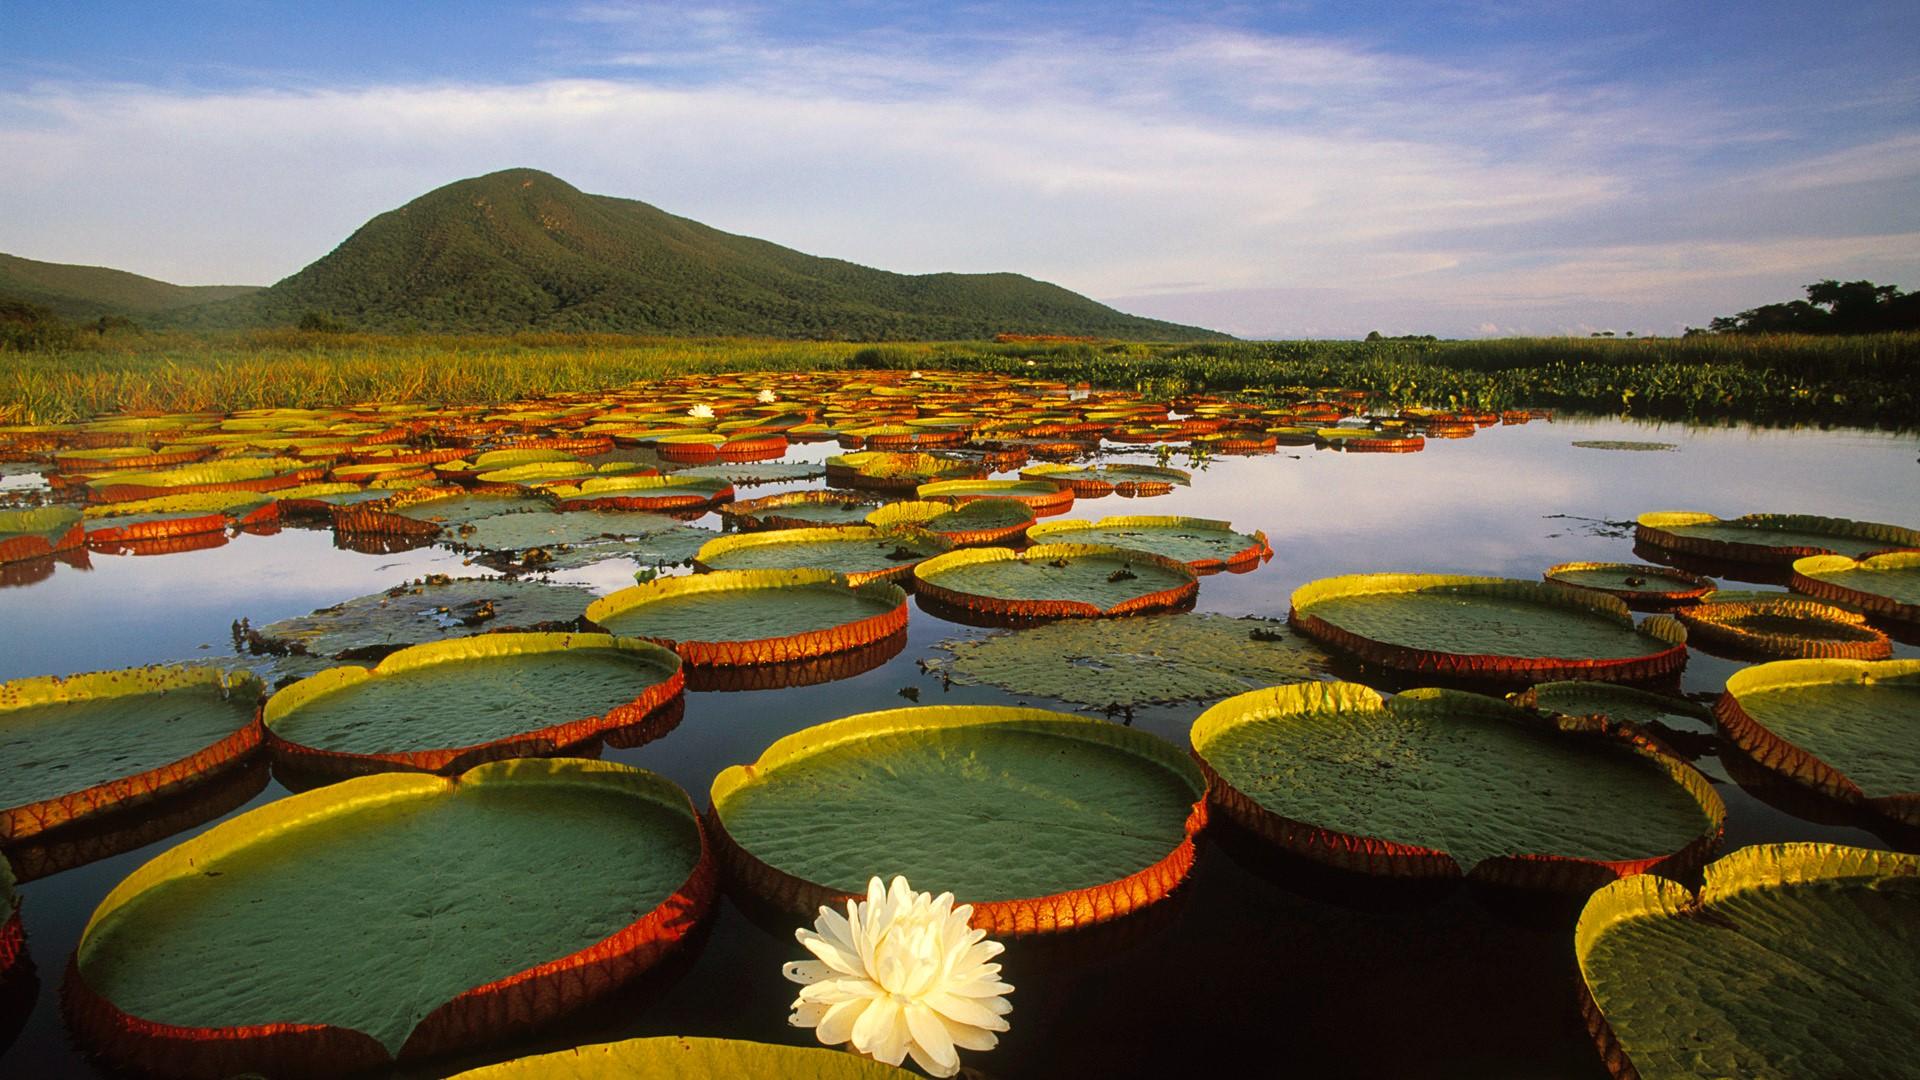 El Pantanal al Sur de Brasil